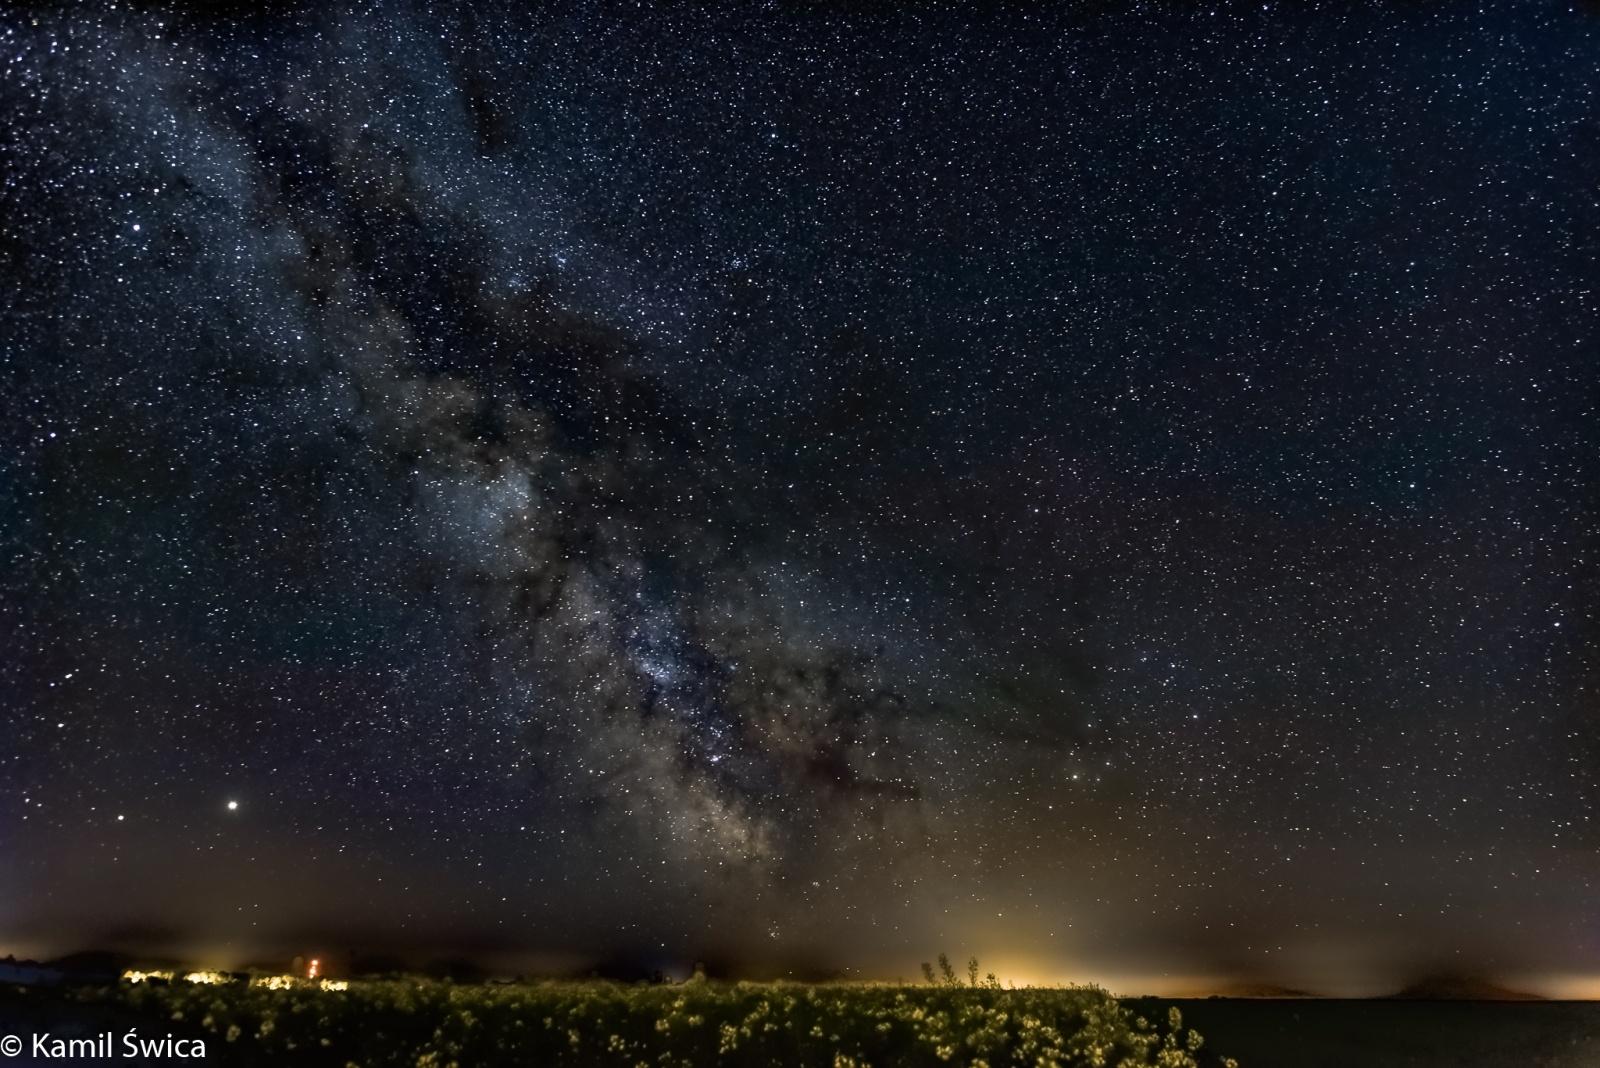 Sequator Image Milky Way JPEG Żabia Wola 2020 reduce light polution hdr-3.jpg